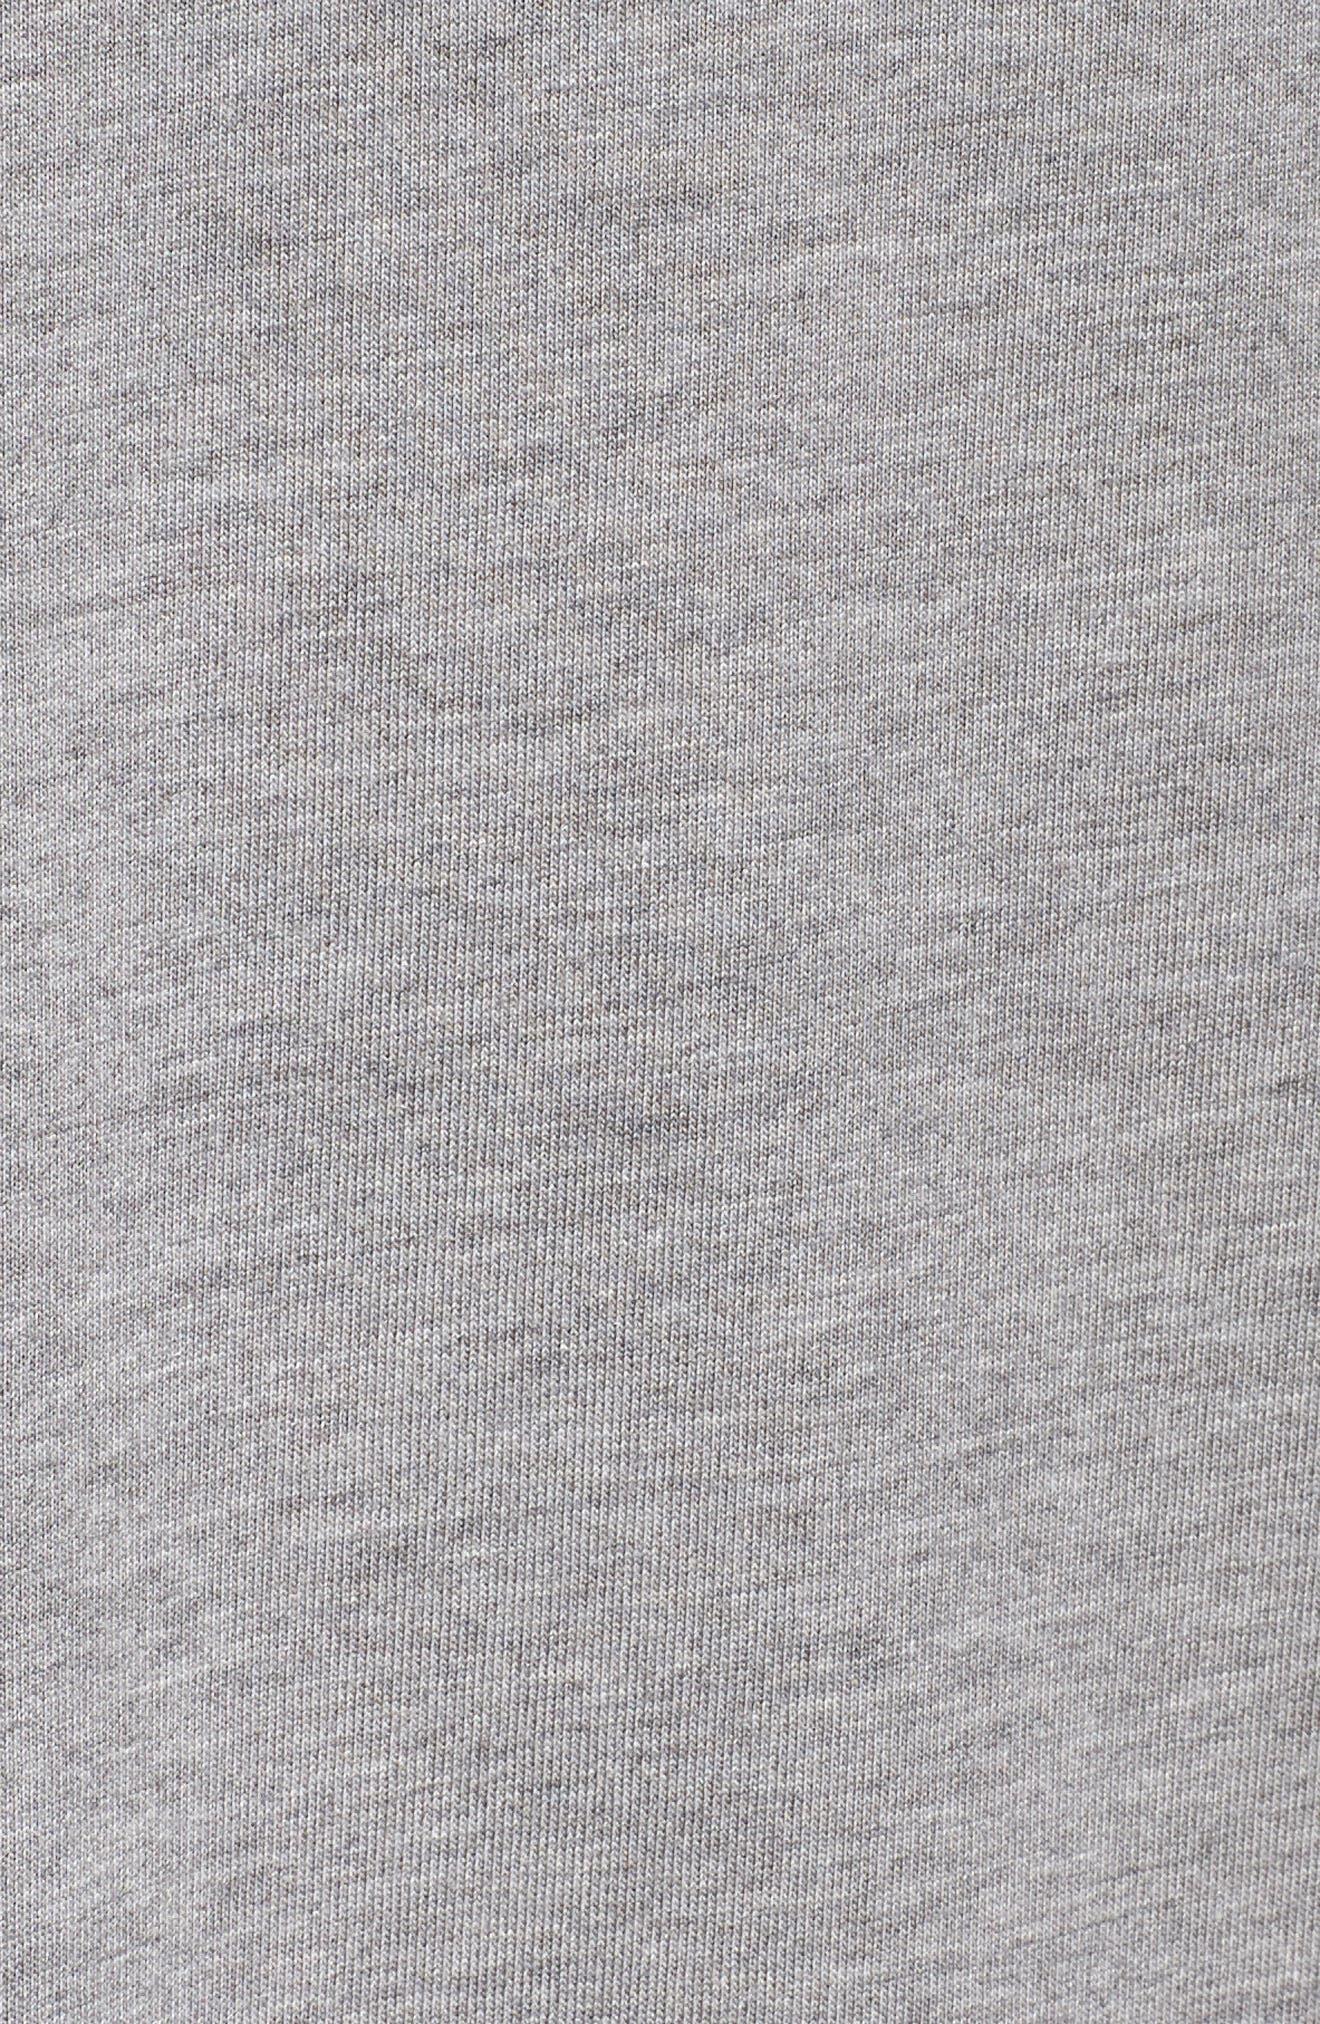 Sportswear Sleeveless Dress,                             Alternate thumbnail 11, color,